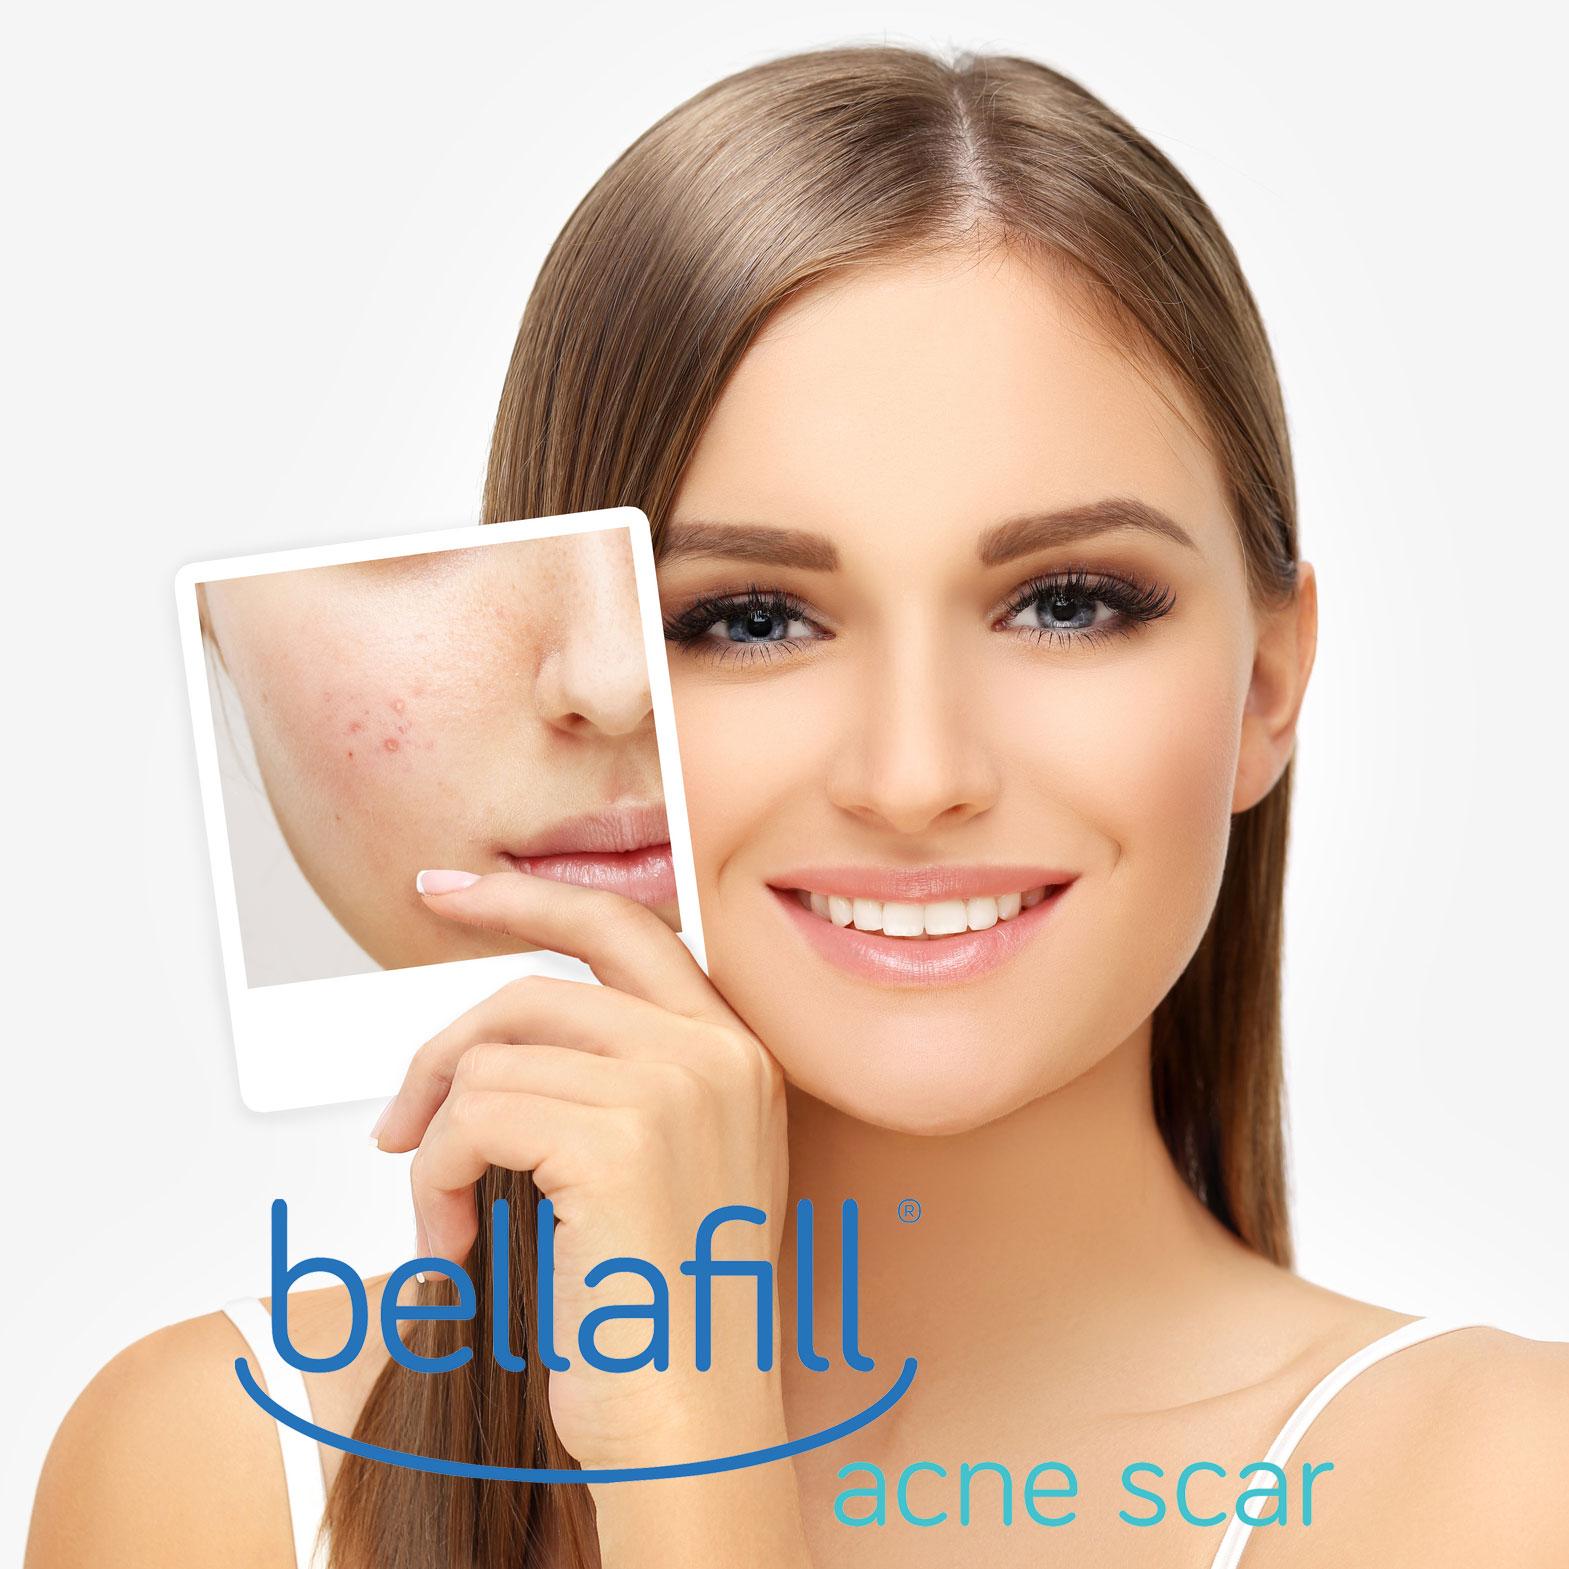 Dermatology: Bellafill® Dermal Filler For Acne Scars » Premier Dermatology